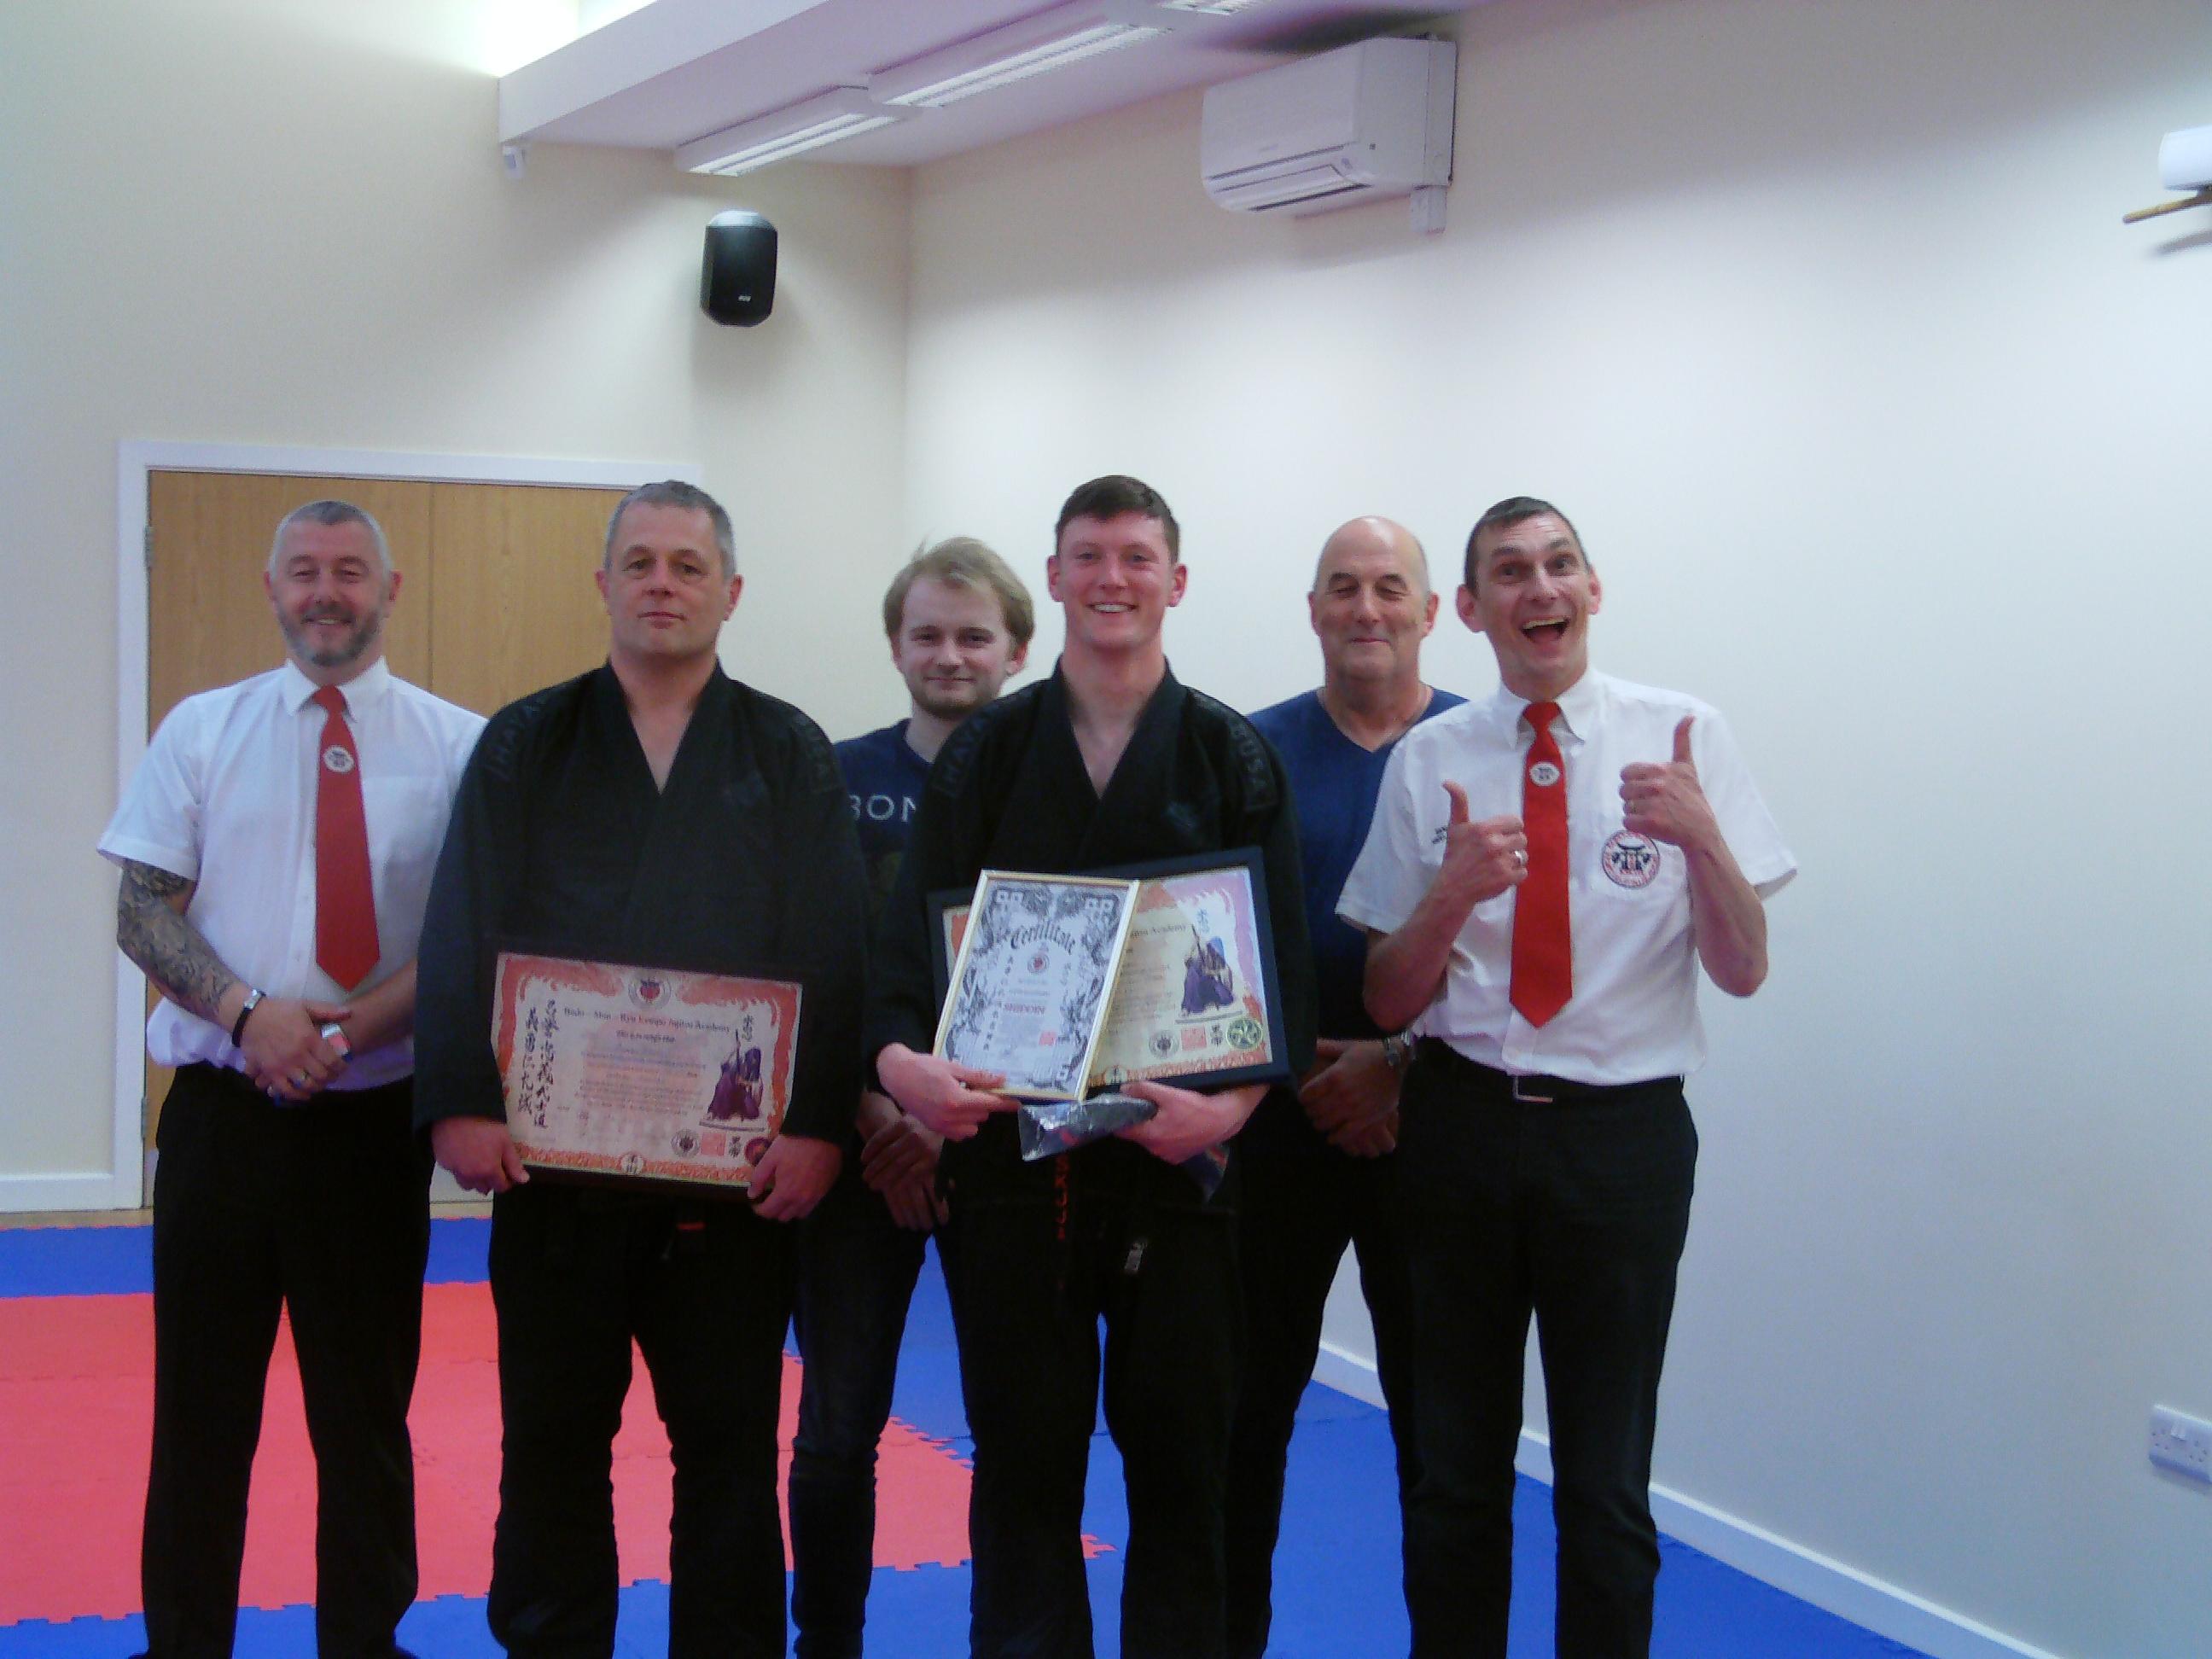 Bertie & Doc achieving their Dan grade awards.